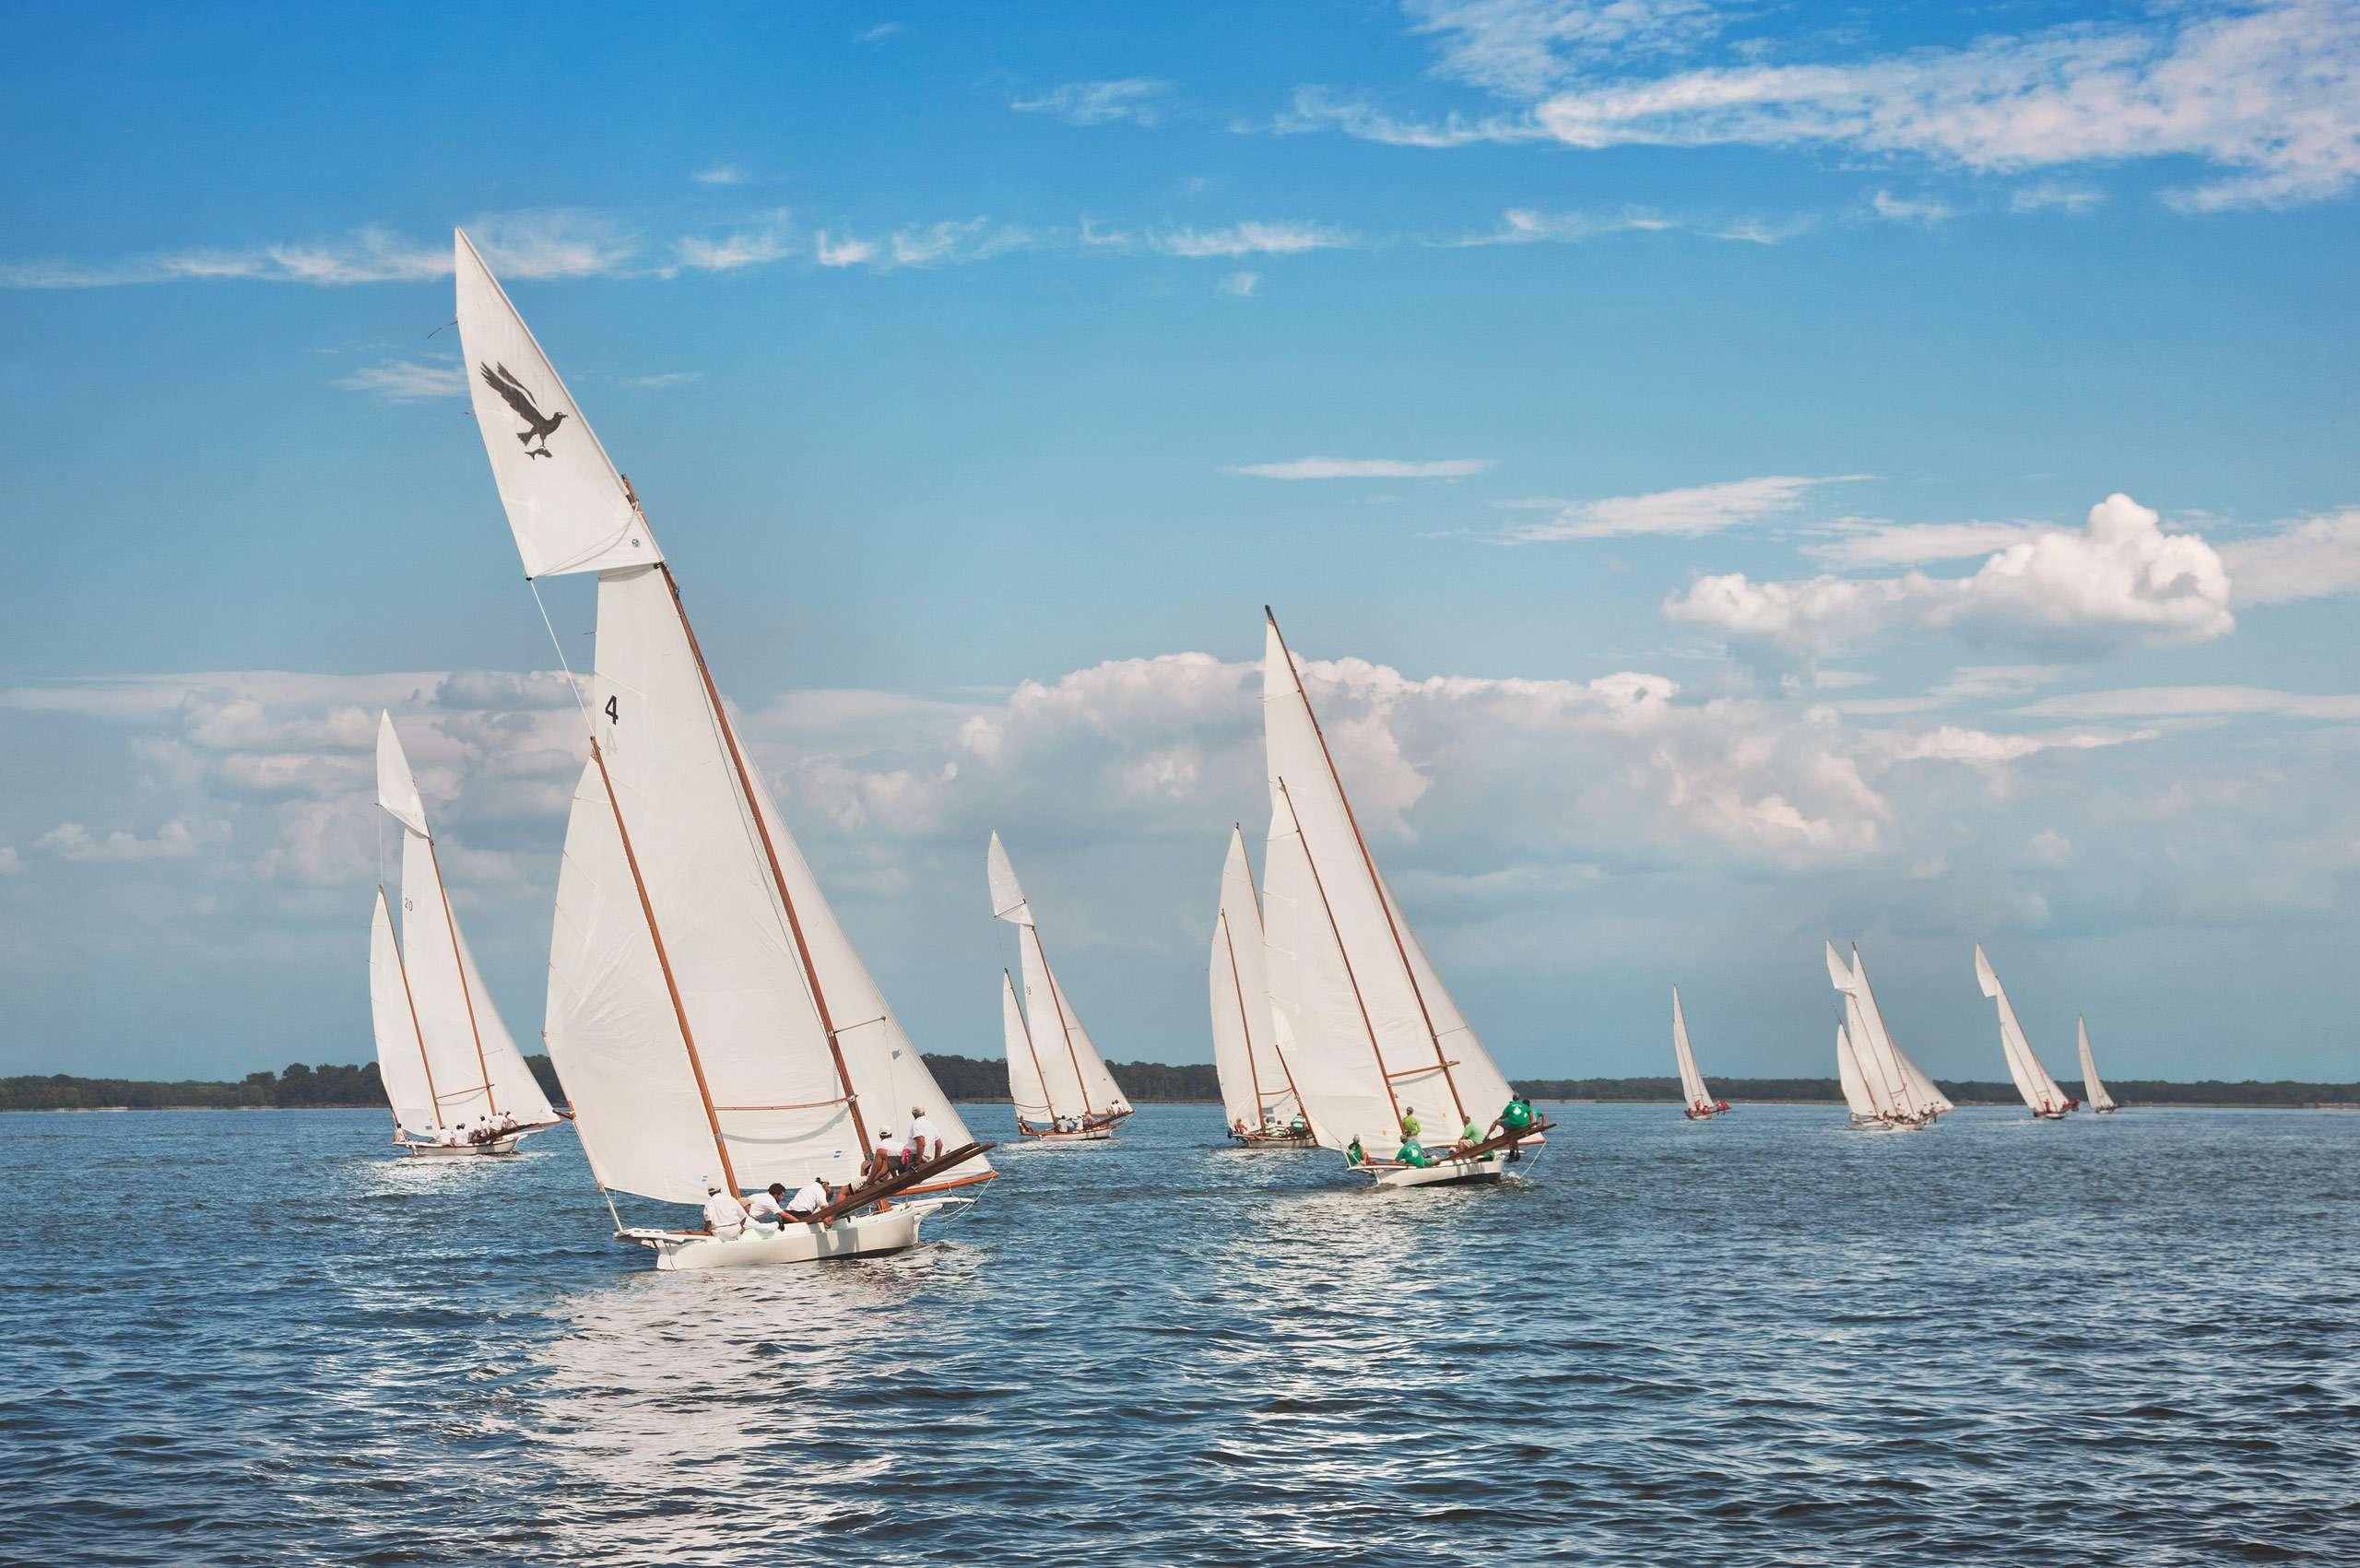 PORTFOLIO - Sailing - Log Canoes #26   PCG576